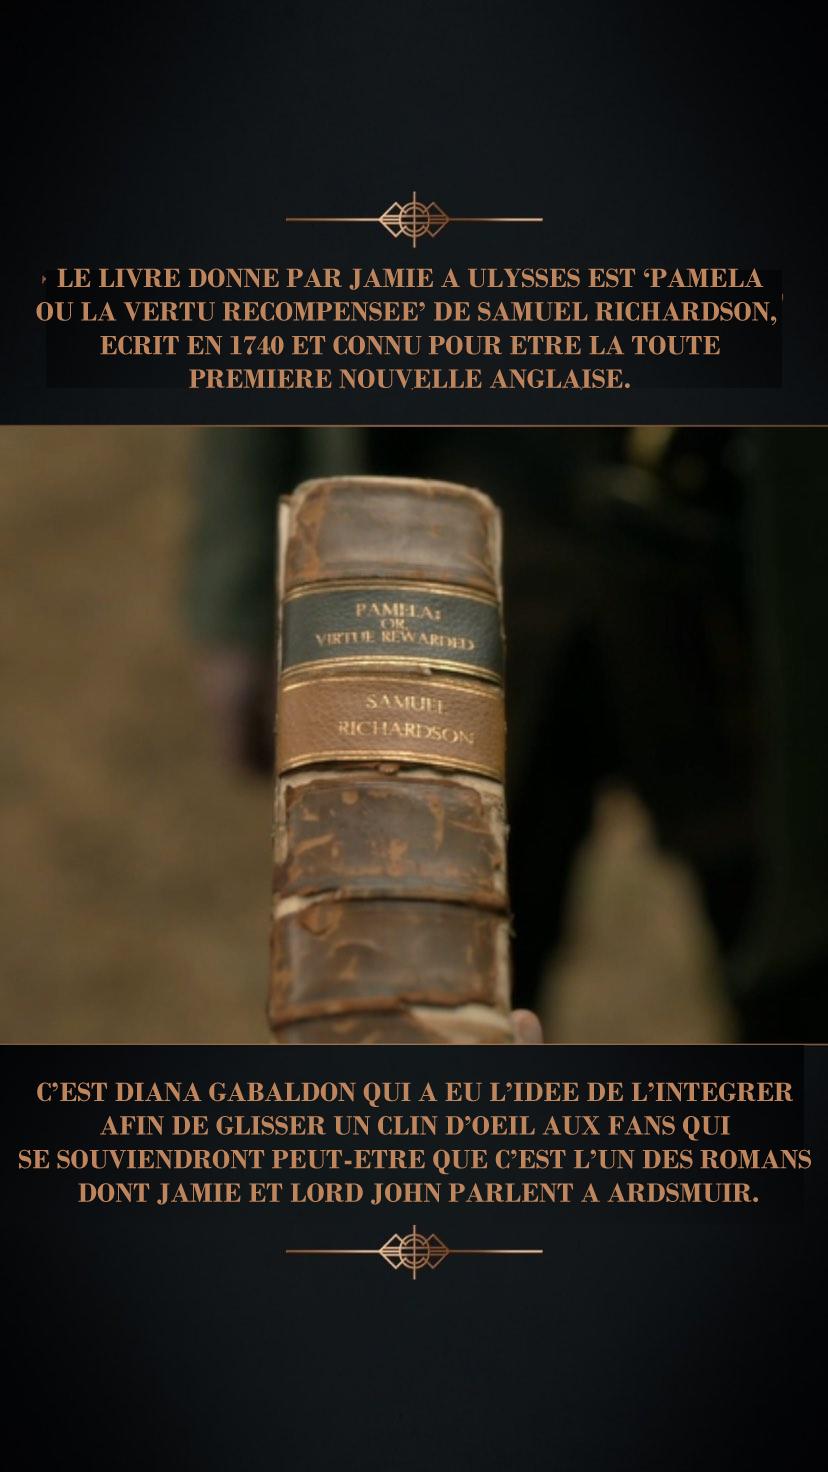 Anecdote coulisse episode 11 saison 5 Outlander